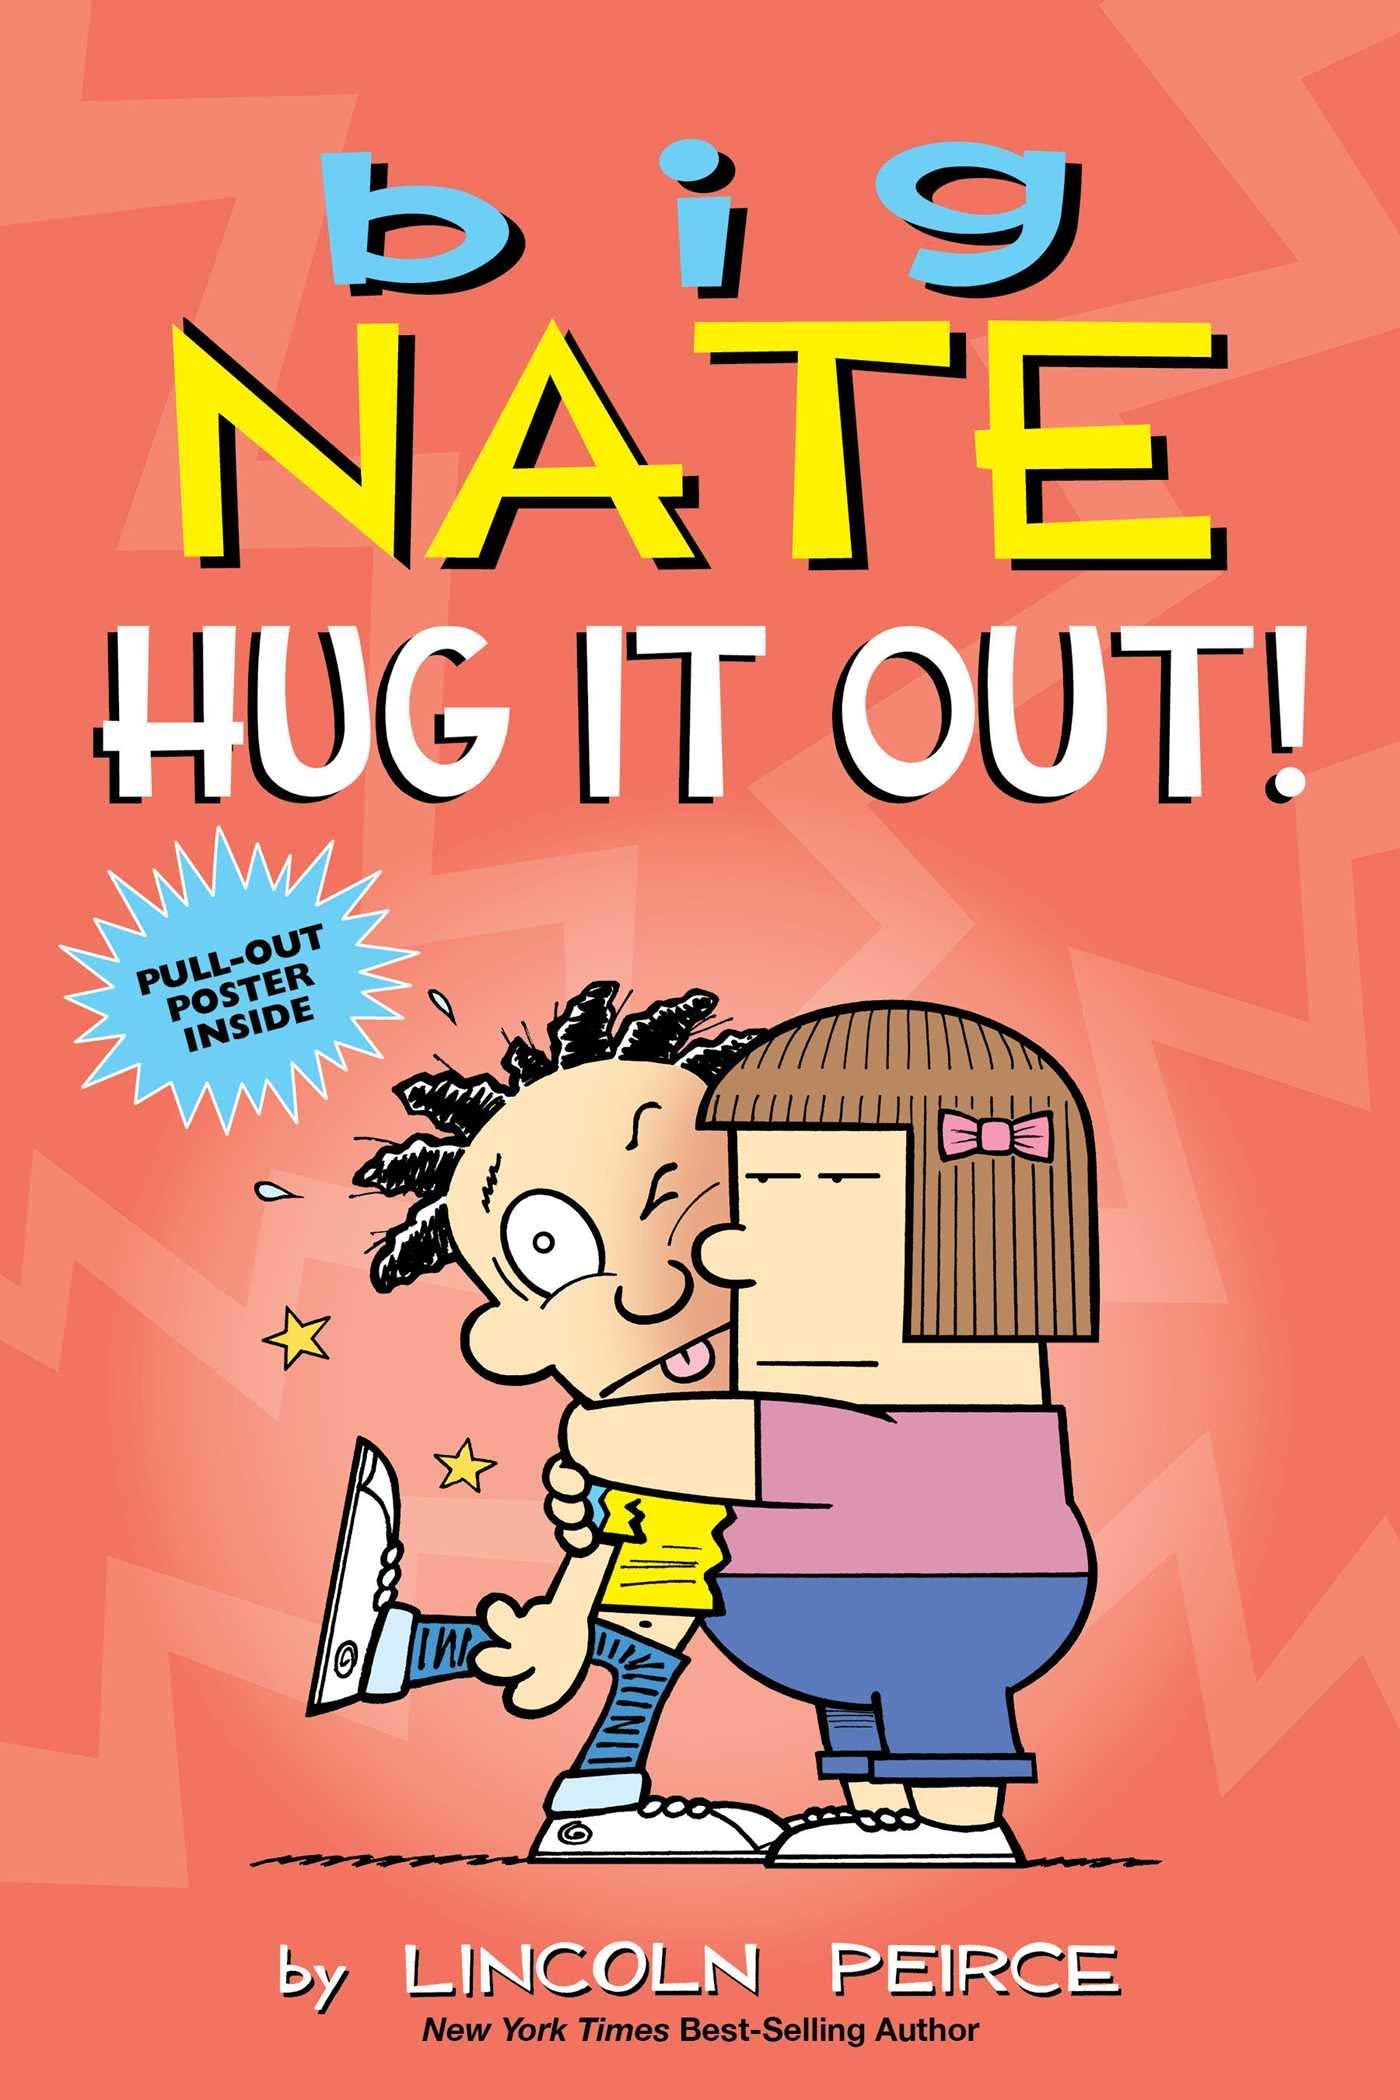 Amazon.com: Big Nate: Hug It Out! (Volume 21) (9781524851842 ...